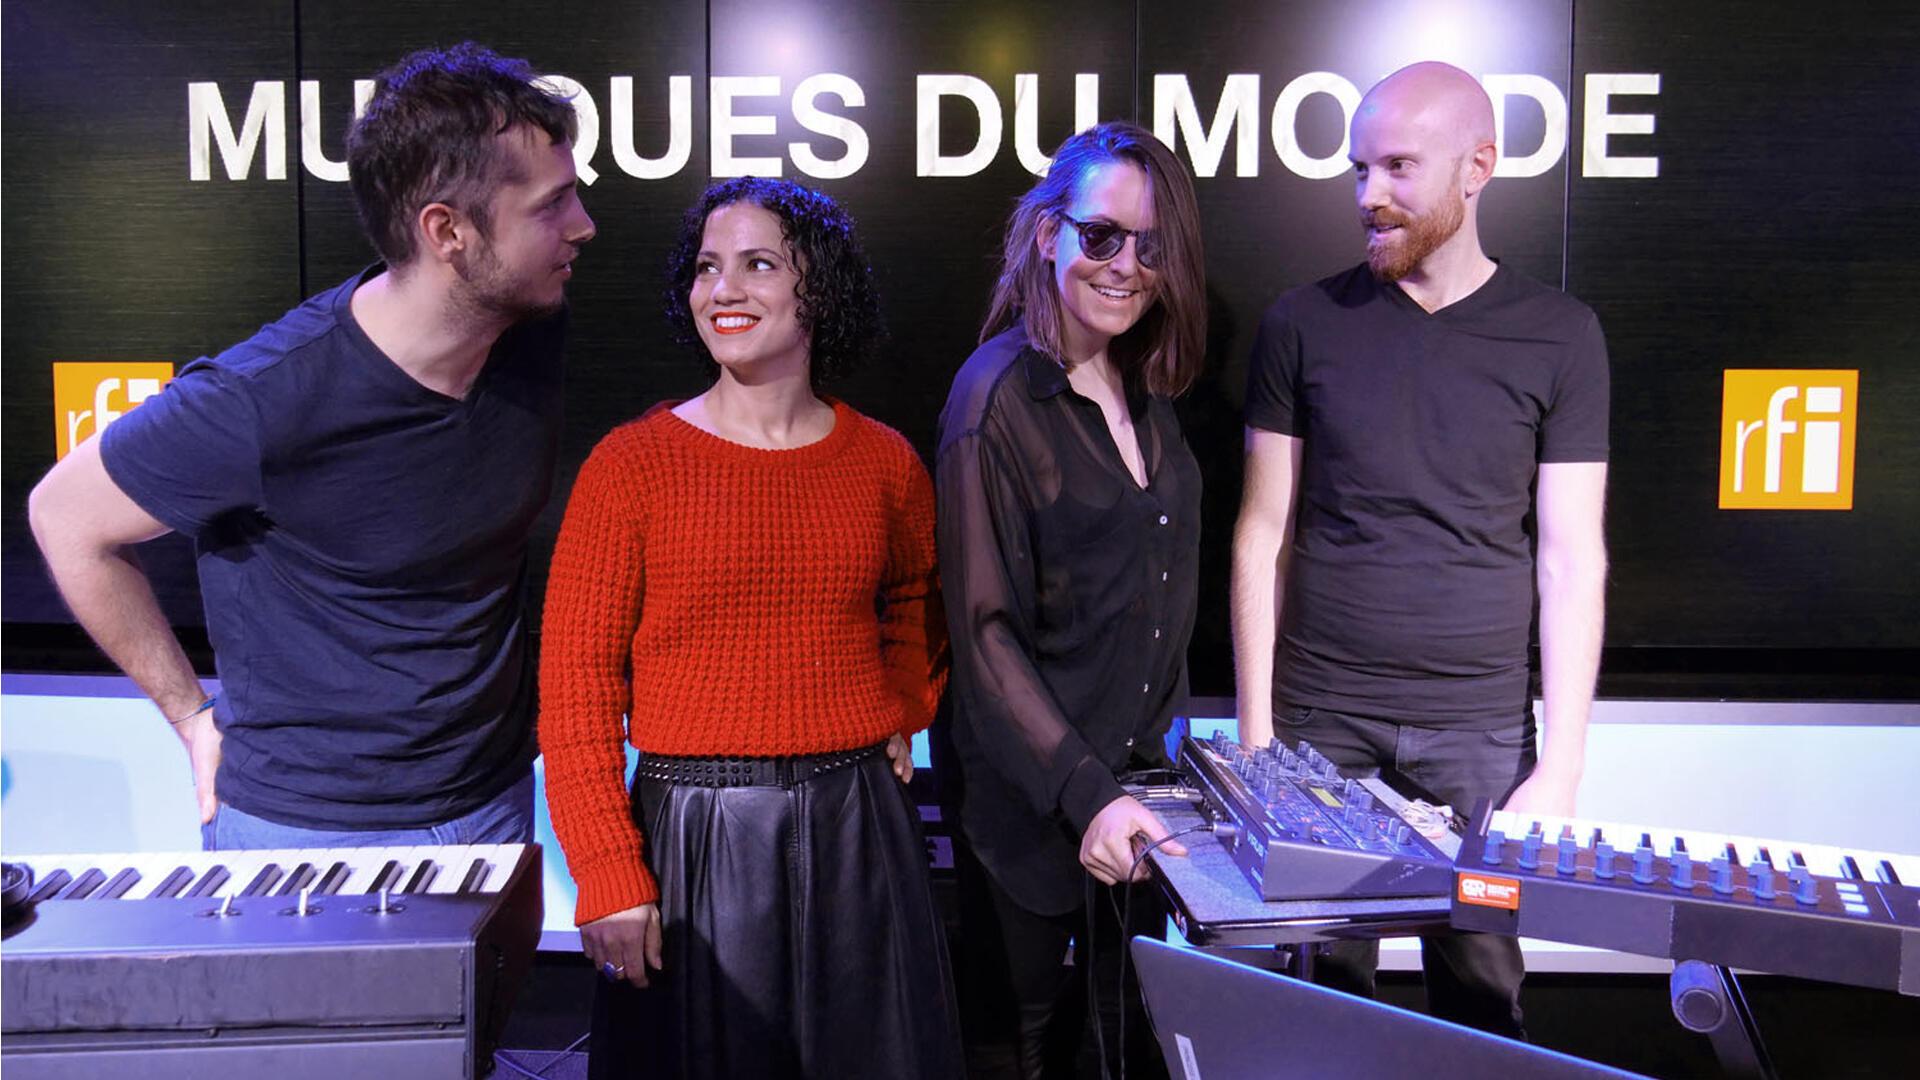 Emel Mathlouthi et ses musiciens à RFI.